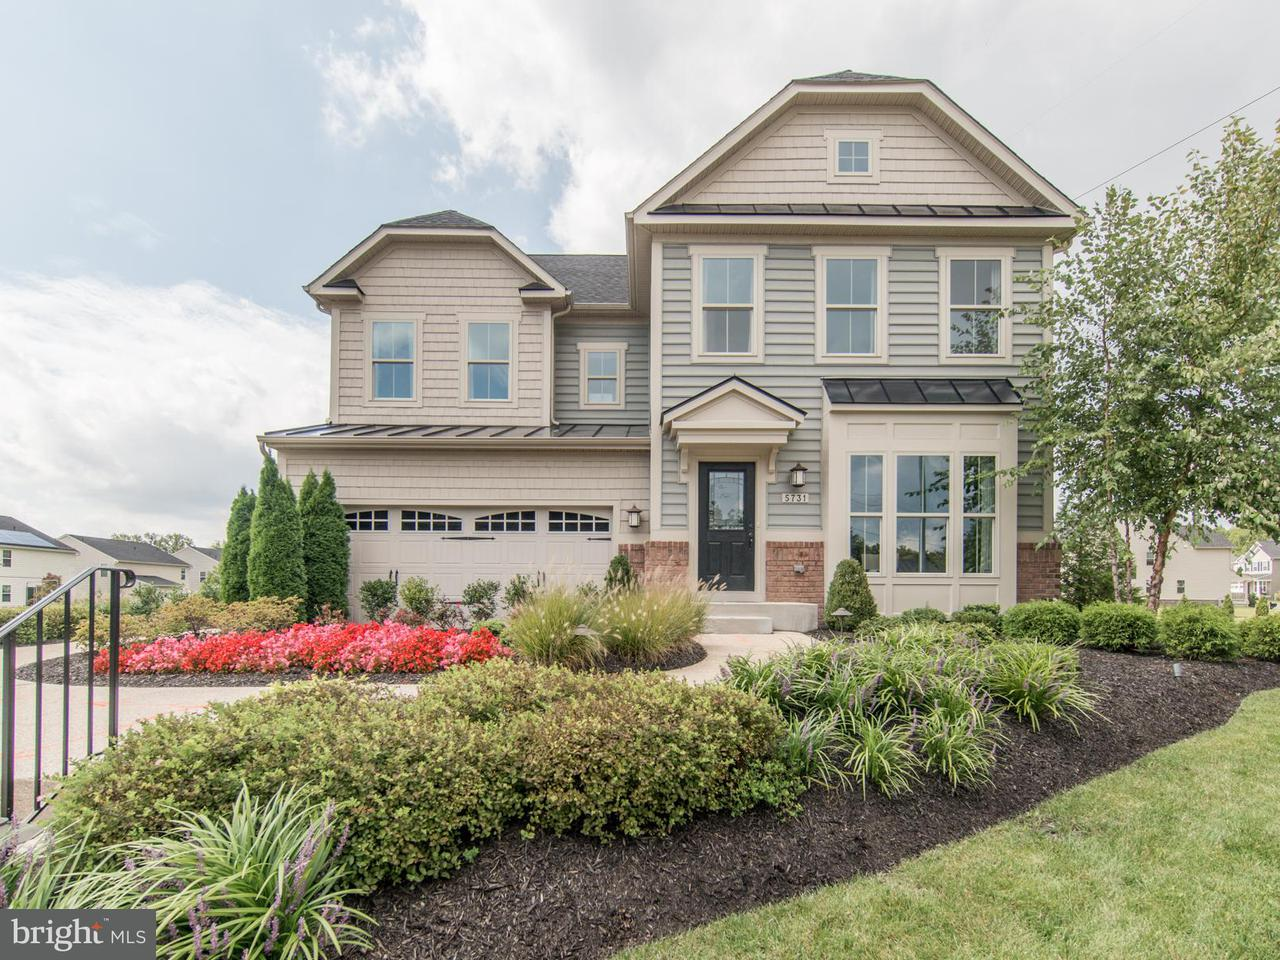 独户住宅 为 销售 在 5731 ALLENDER Road 5731 ALLENDER Road White Marsh, 马里兰州 21162 美国